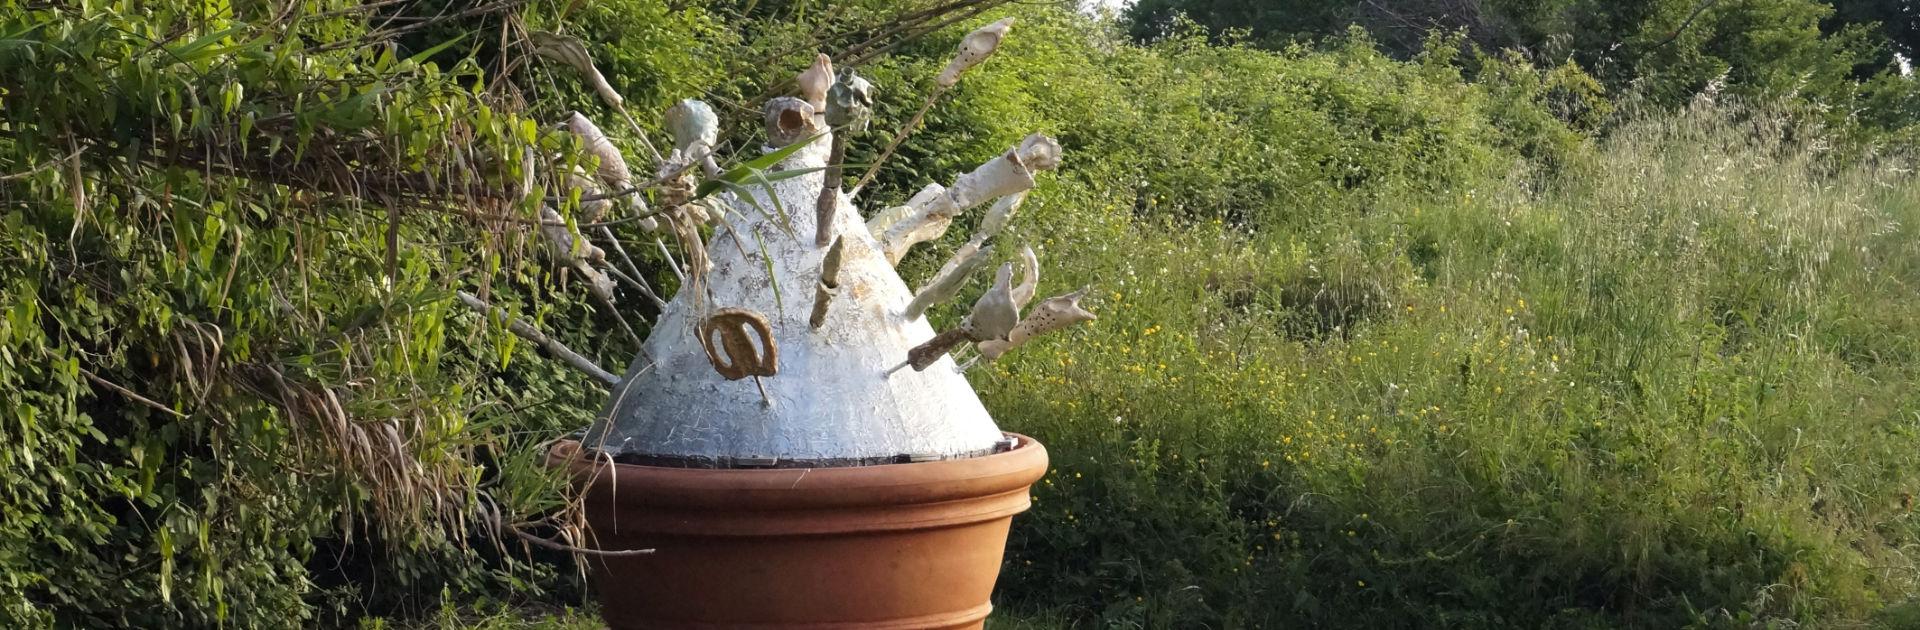 Künstlerin Rosa Roedelius im Giardino di Daniel Spoerri